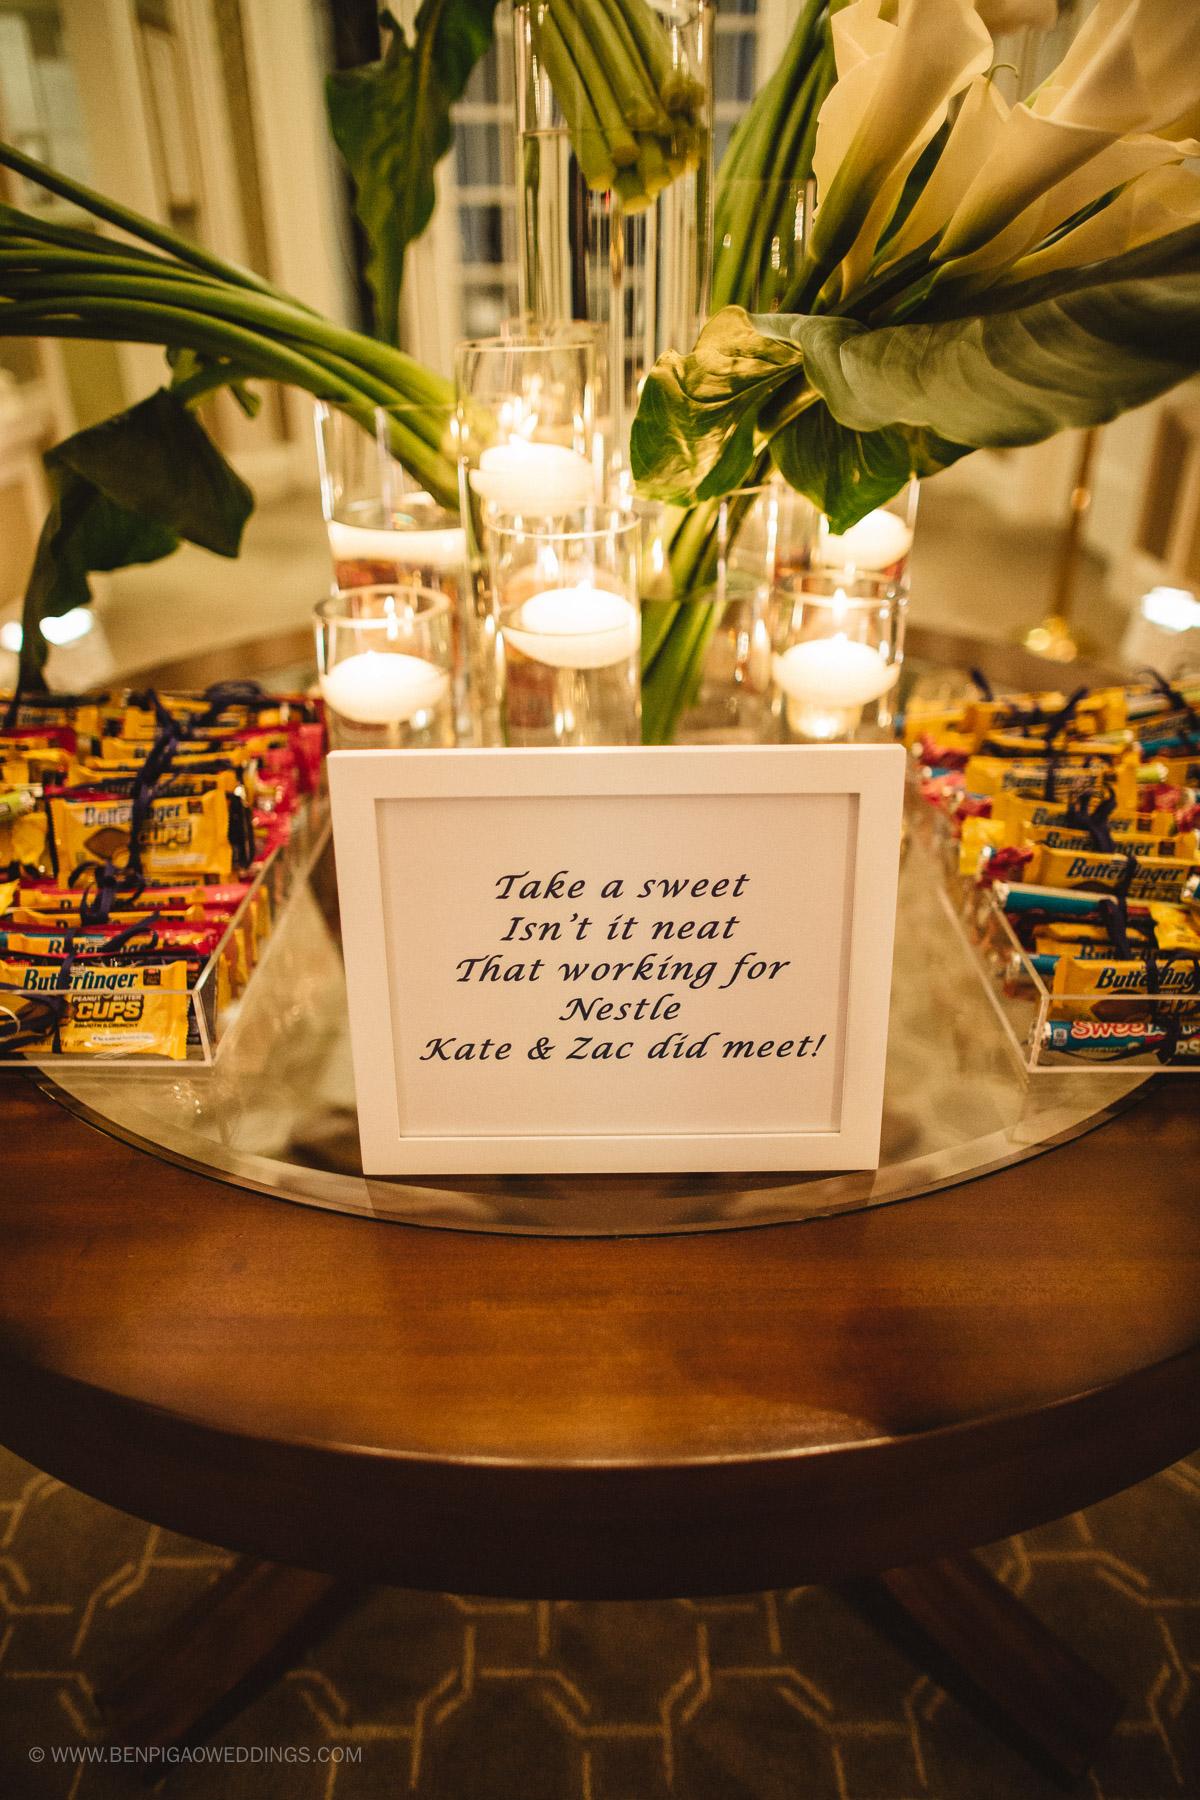 Unique Guest Book Ideas - Portland, Oregon Waverley Country Club Wedding